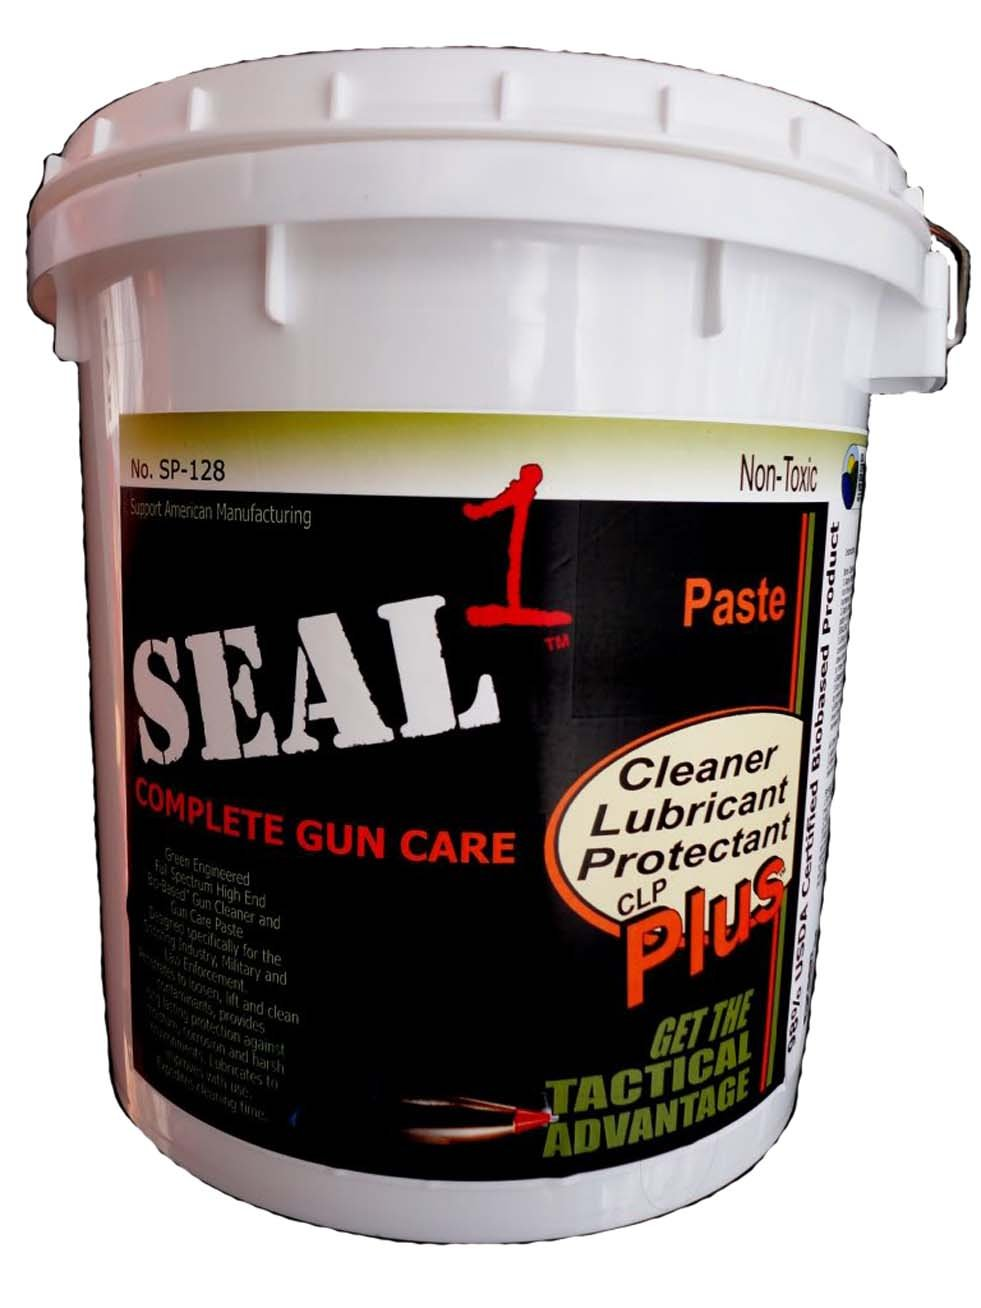 SEAL 1 CLP Plus Paste in Pail, 1-Gallon